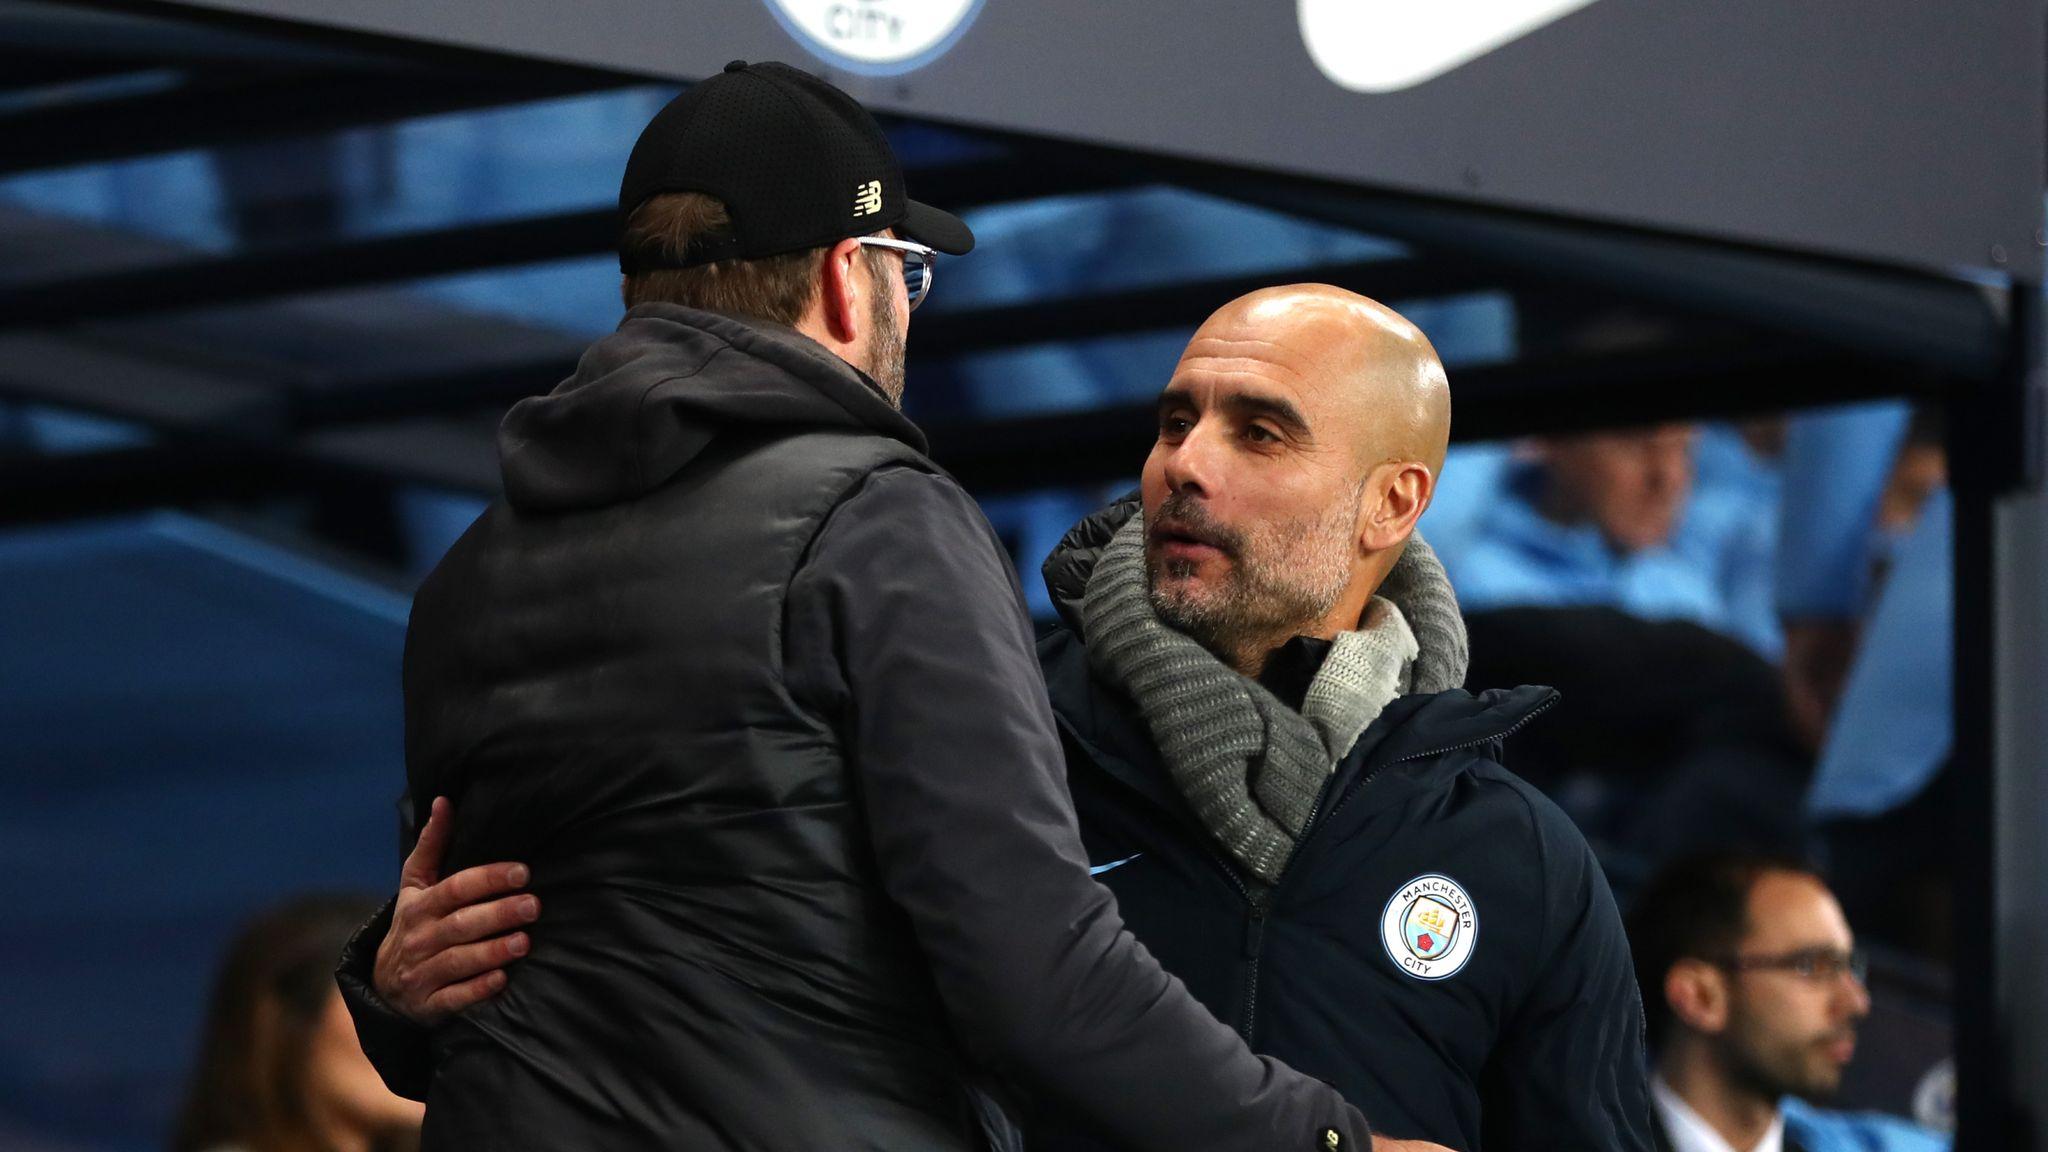 Liverpool a class apart this term, says Man City boss Pep Guardiola